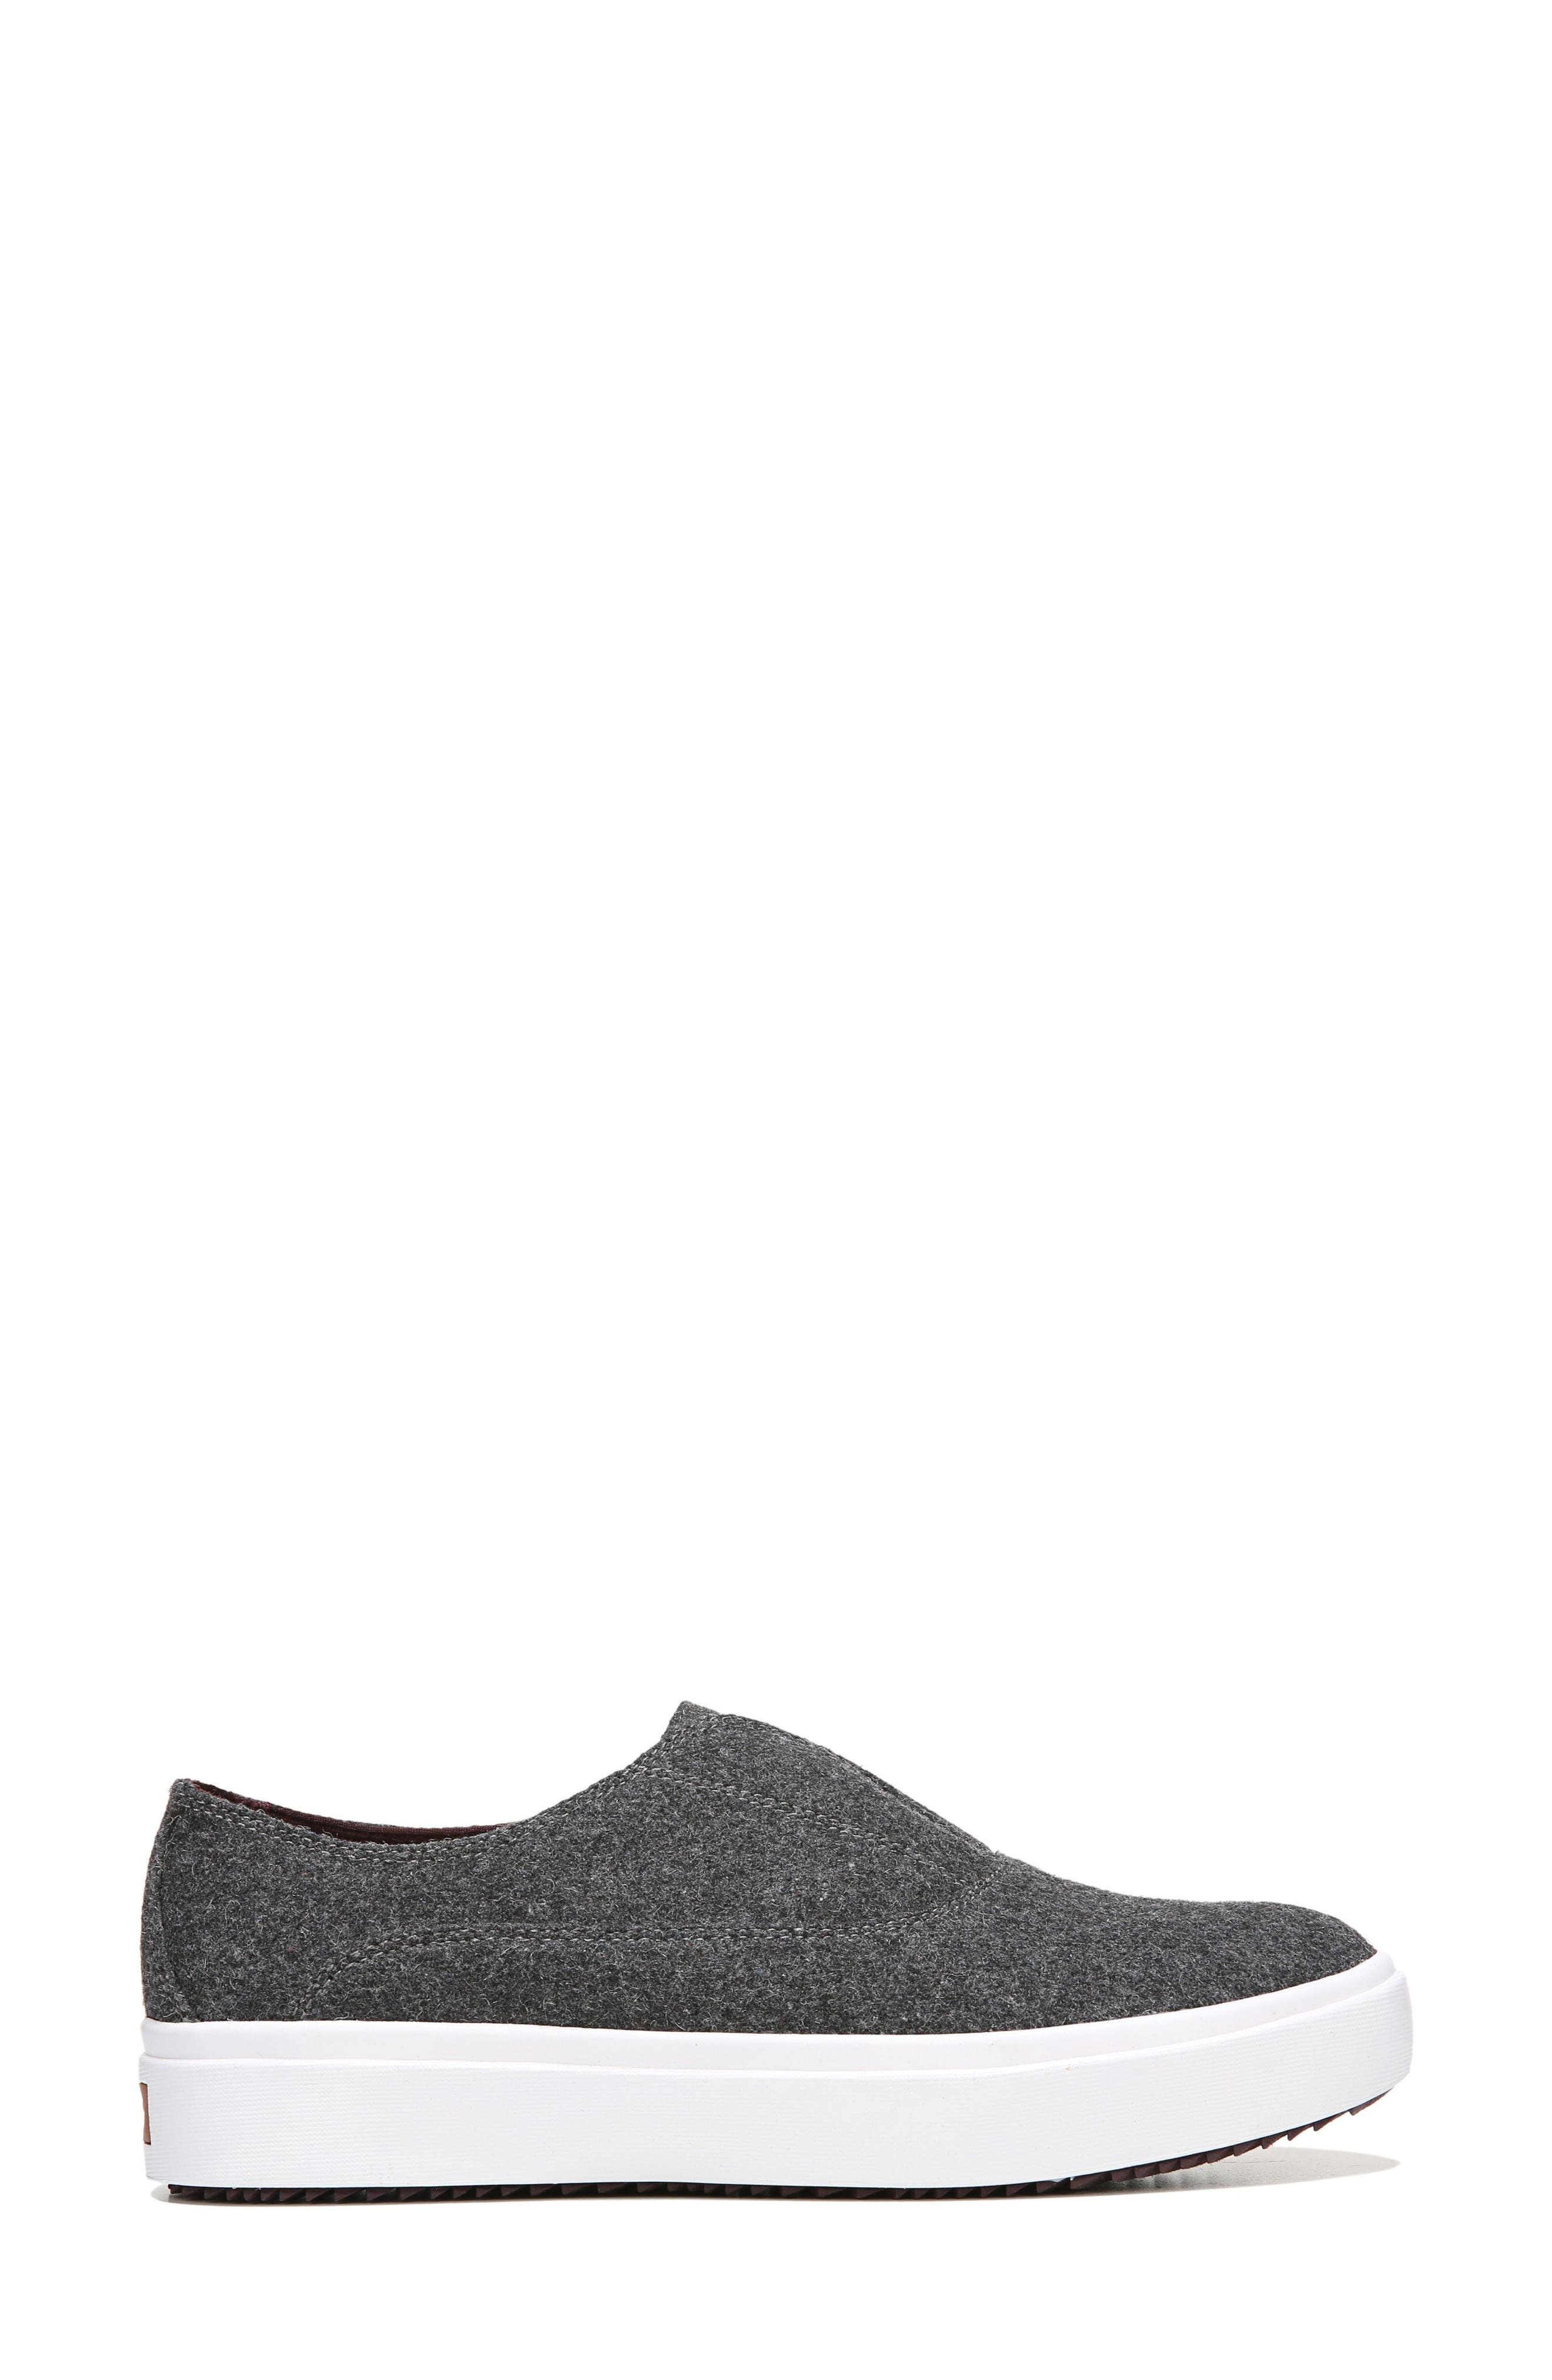 Alternate Image 3  - Dr. Scholl's Brey Slip-On Sneaker (Women)